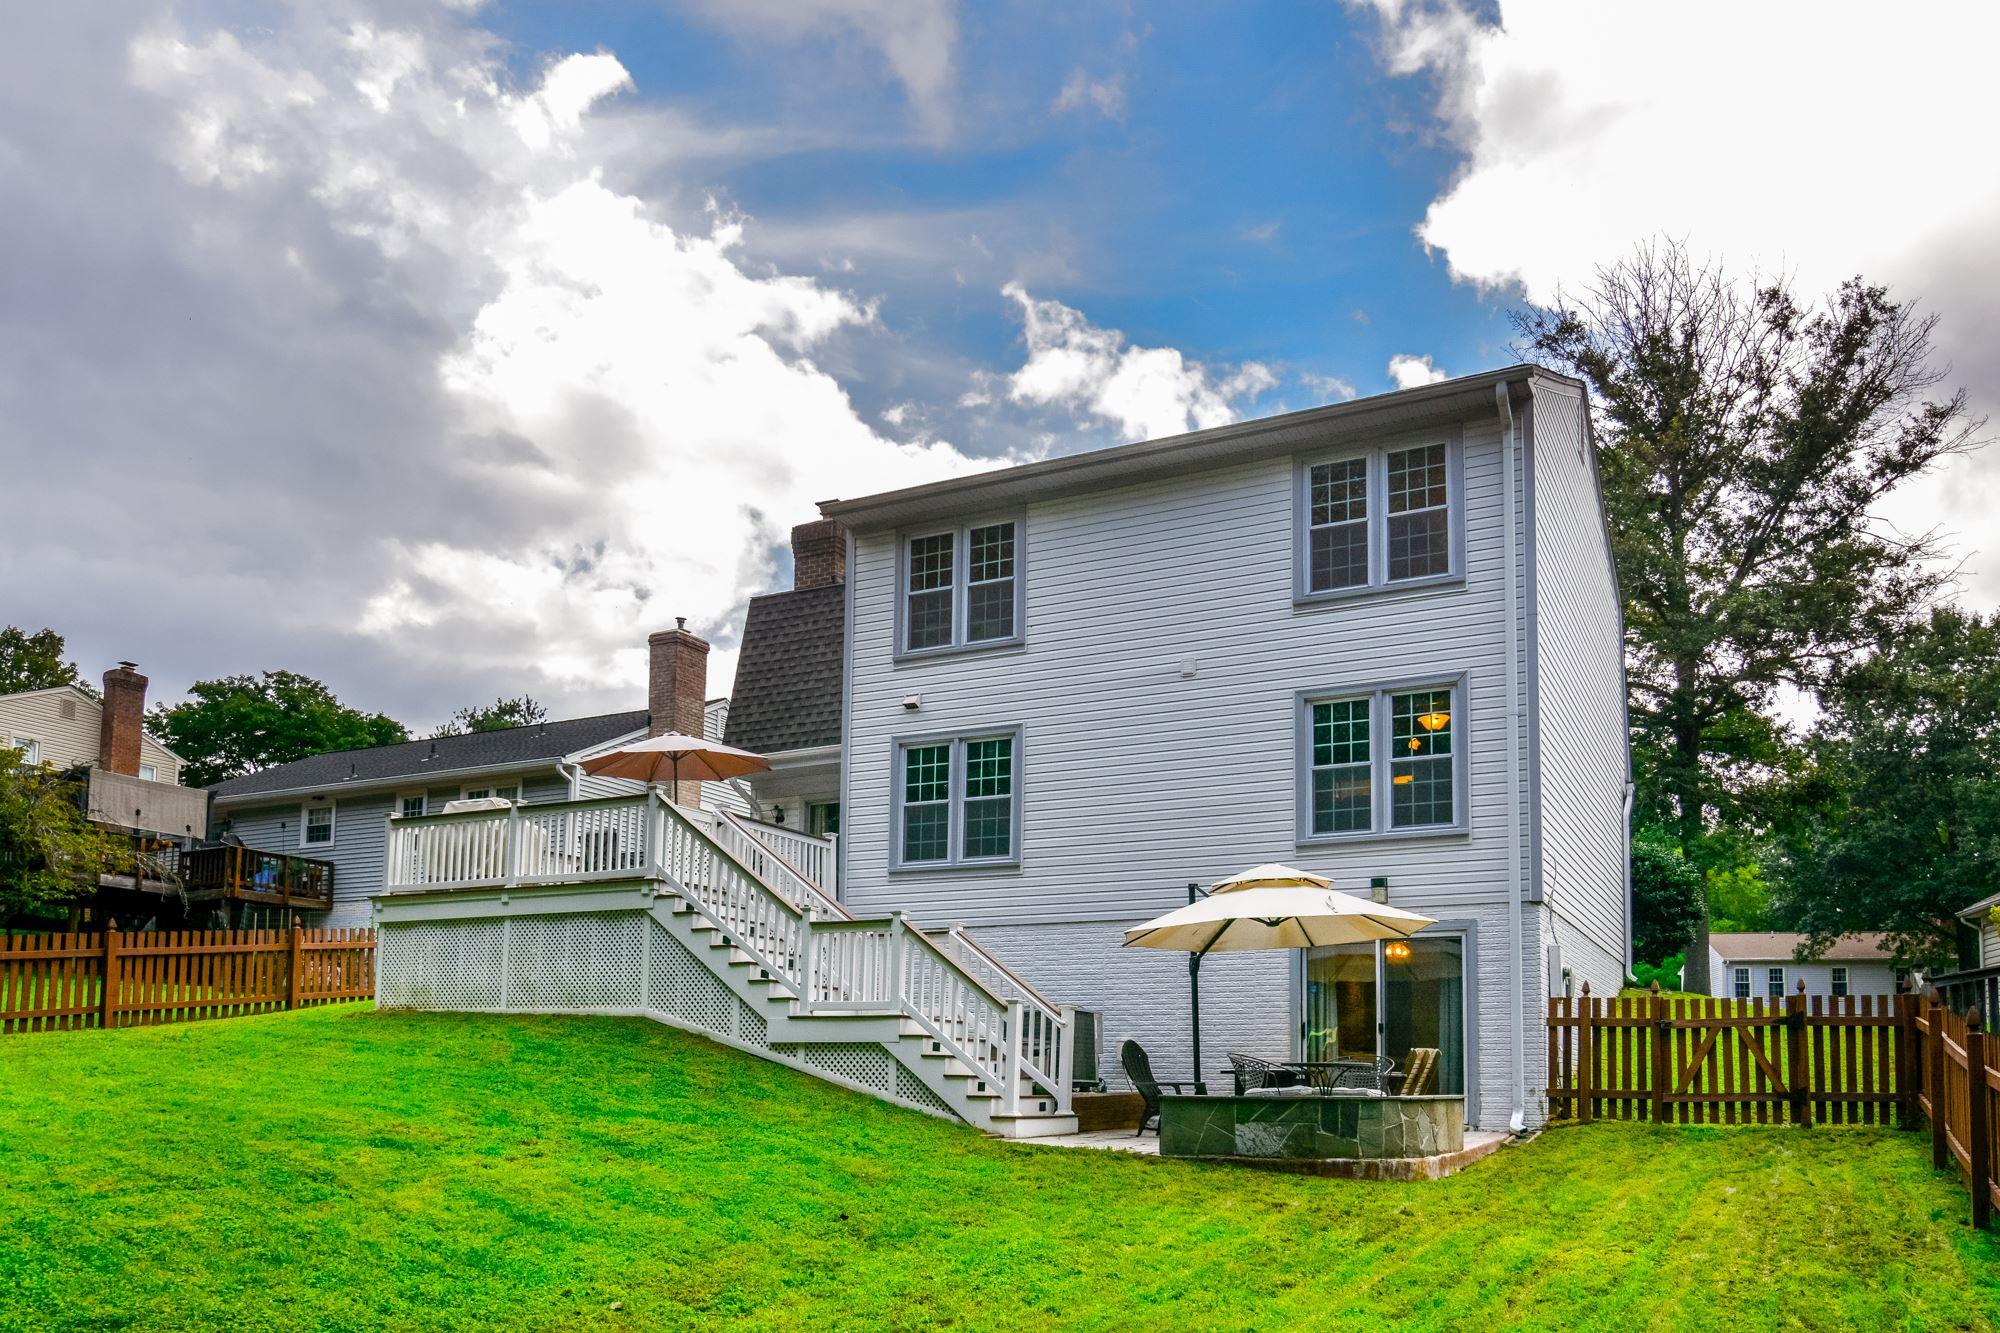 NEW LISTING: 4 BD Woodbridge, VA Home with Walk-out Basement